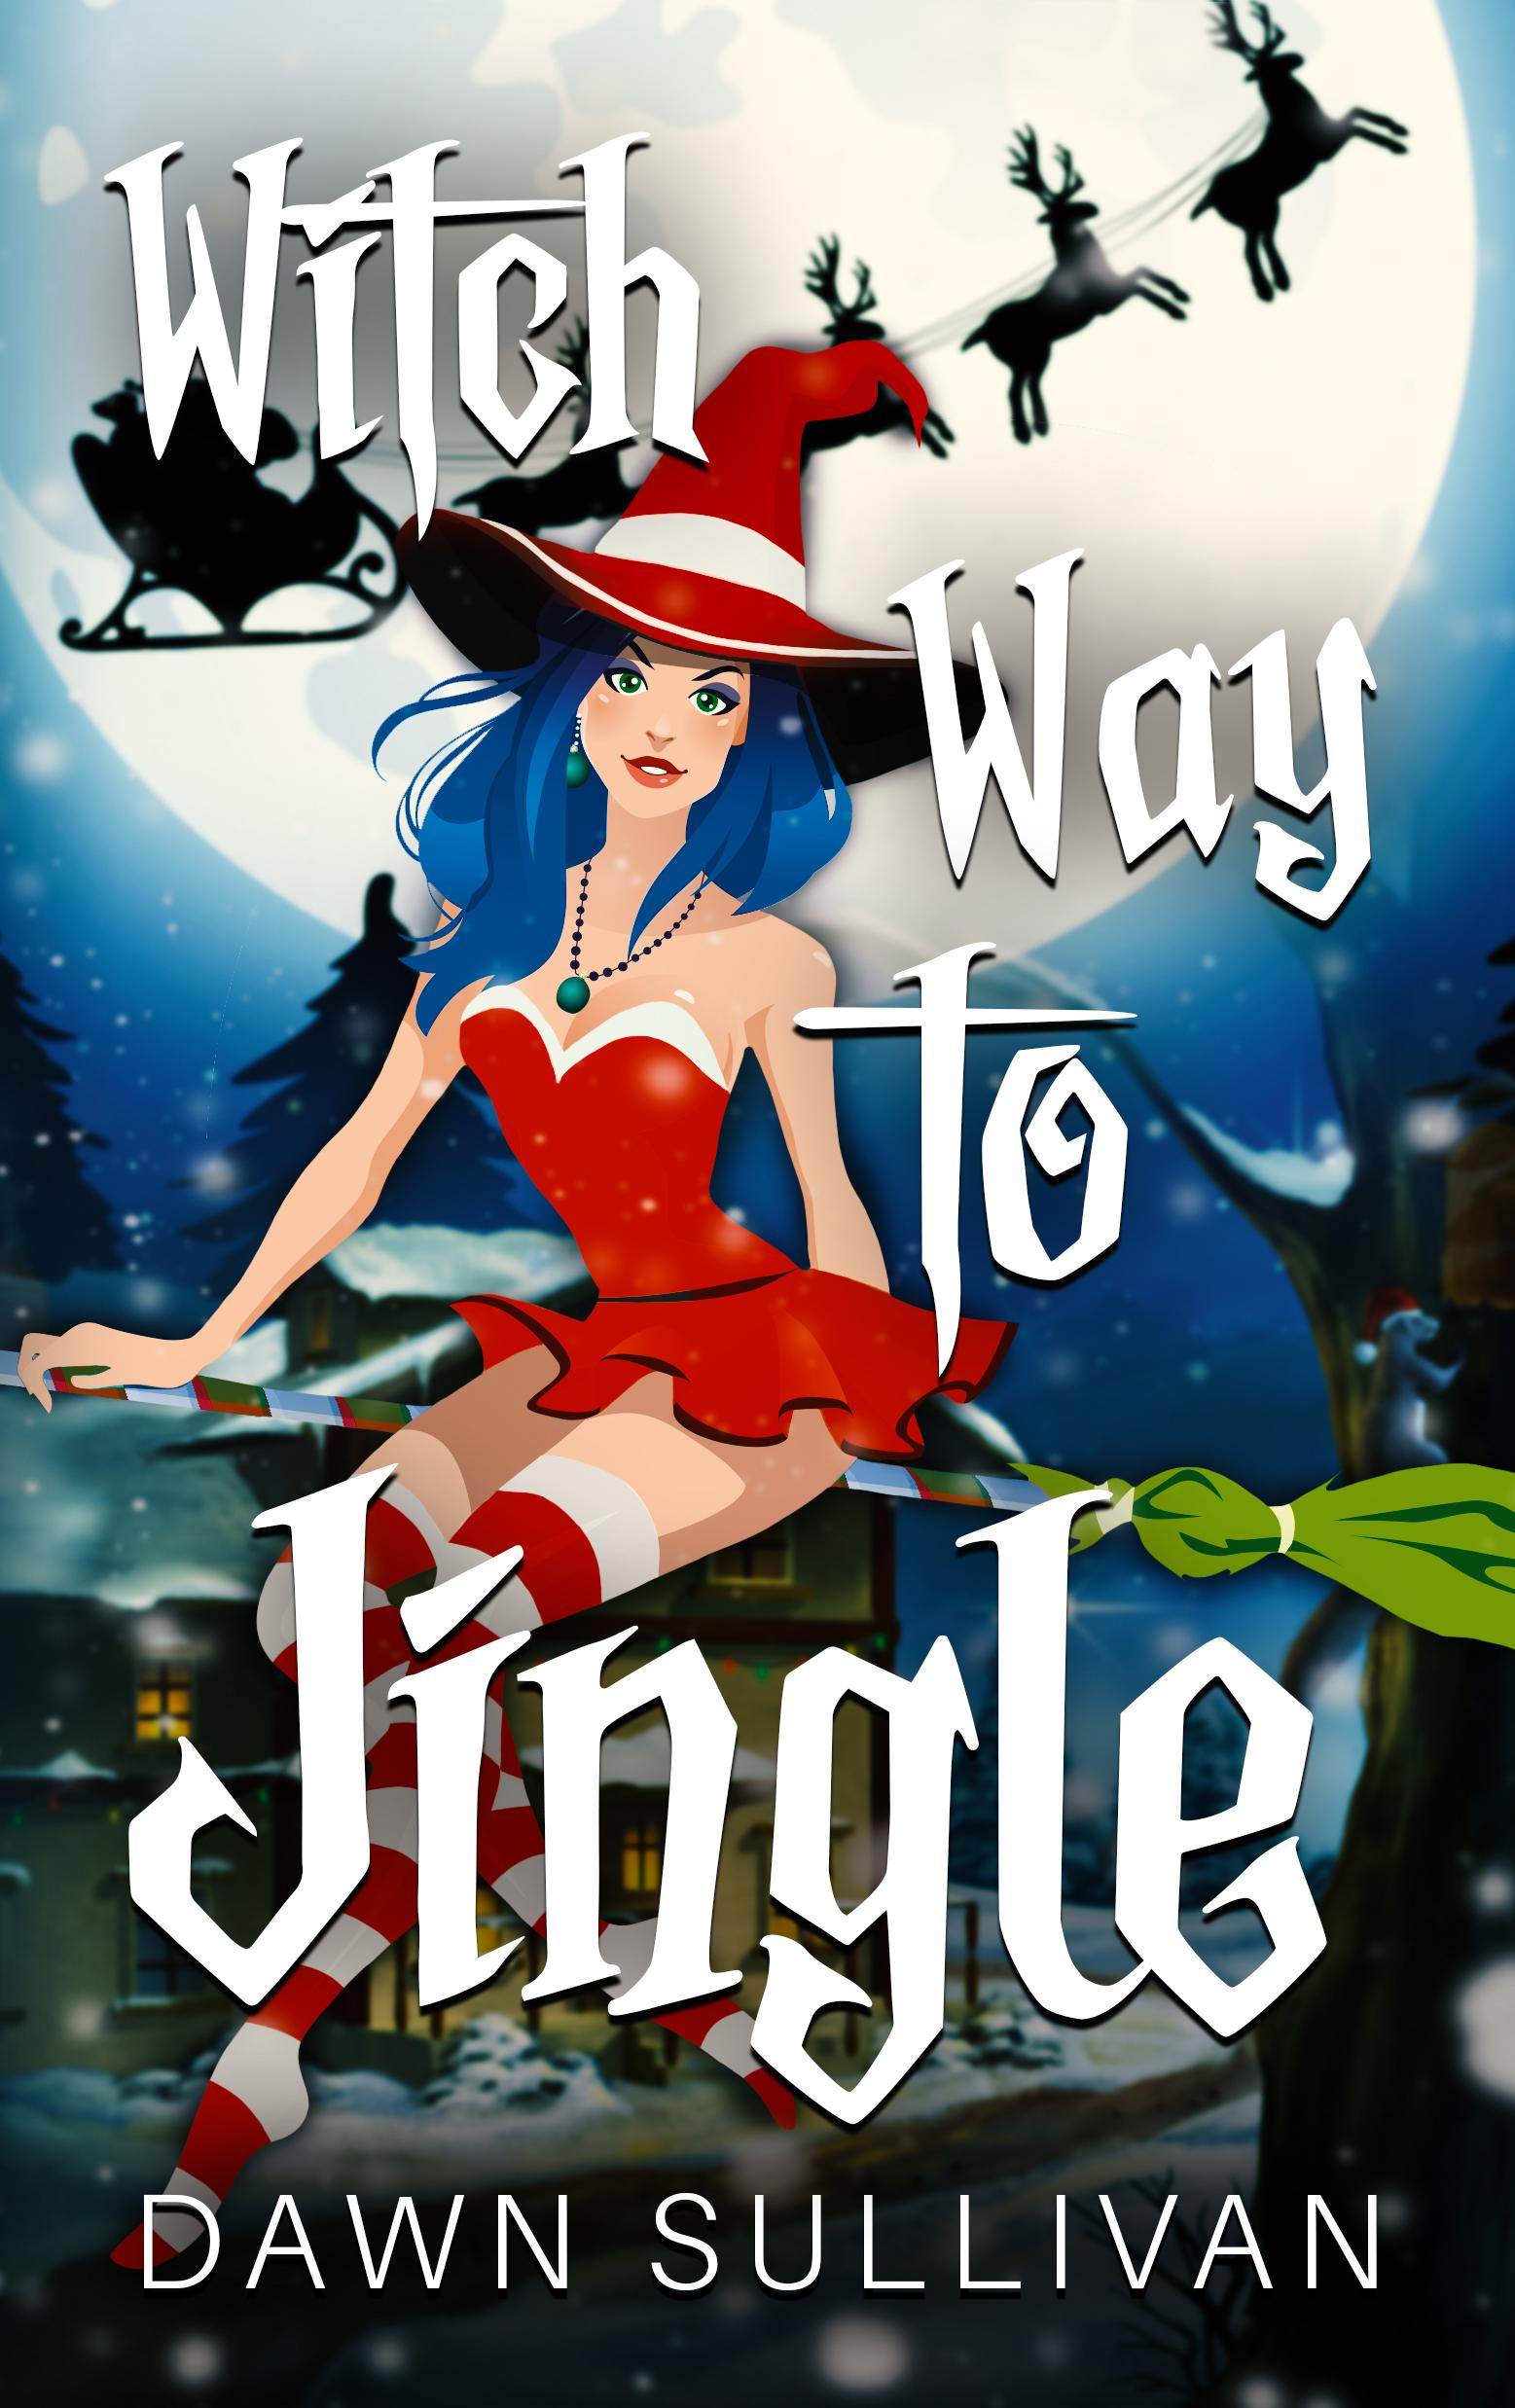 Witch Way To Jingle - E-Cover